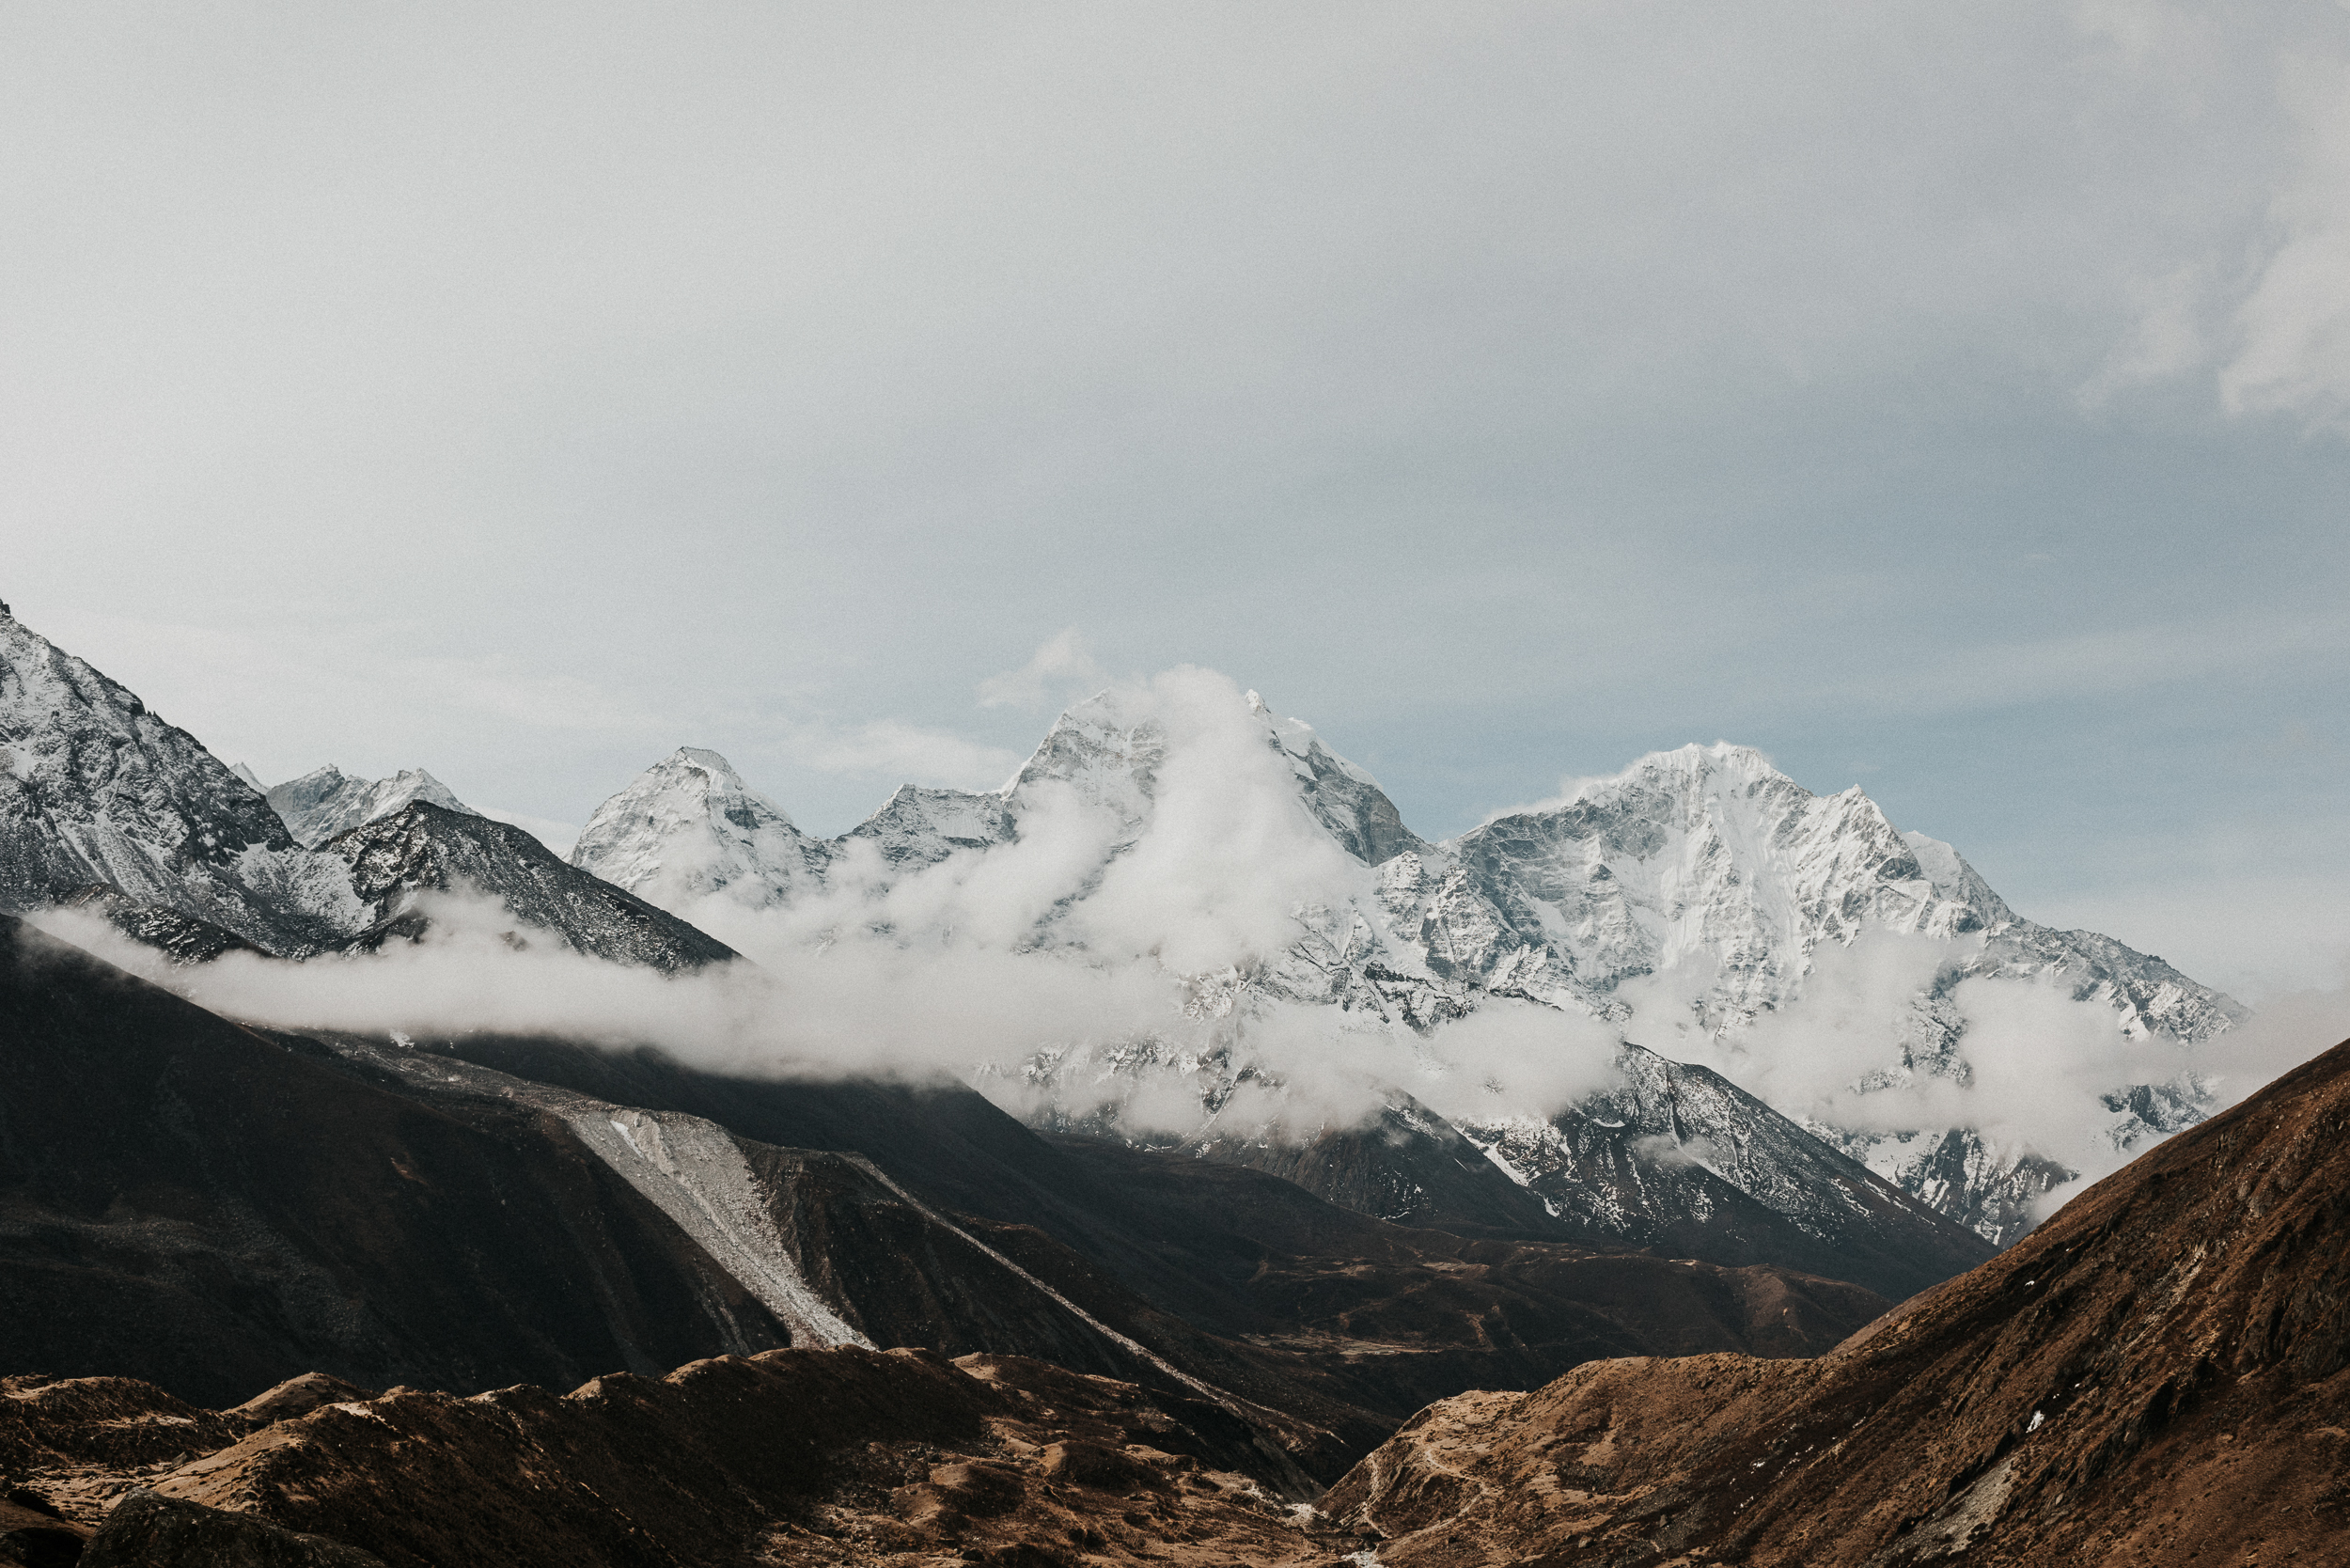 Nepal_EverestBaseCamp_2019_TaraShupe_Photography_DSC_4056.jpg